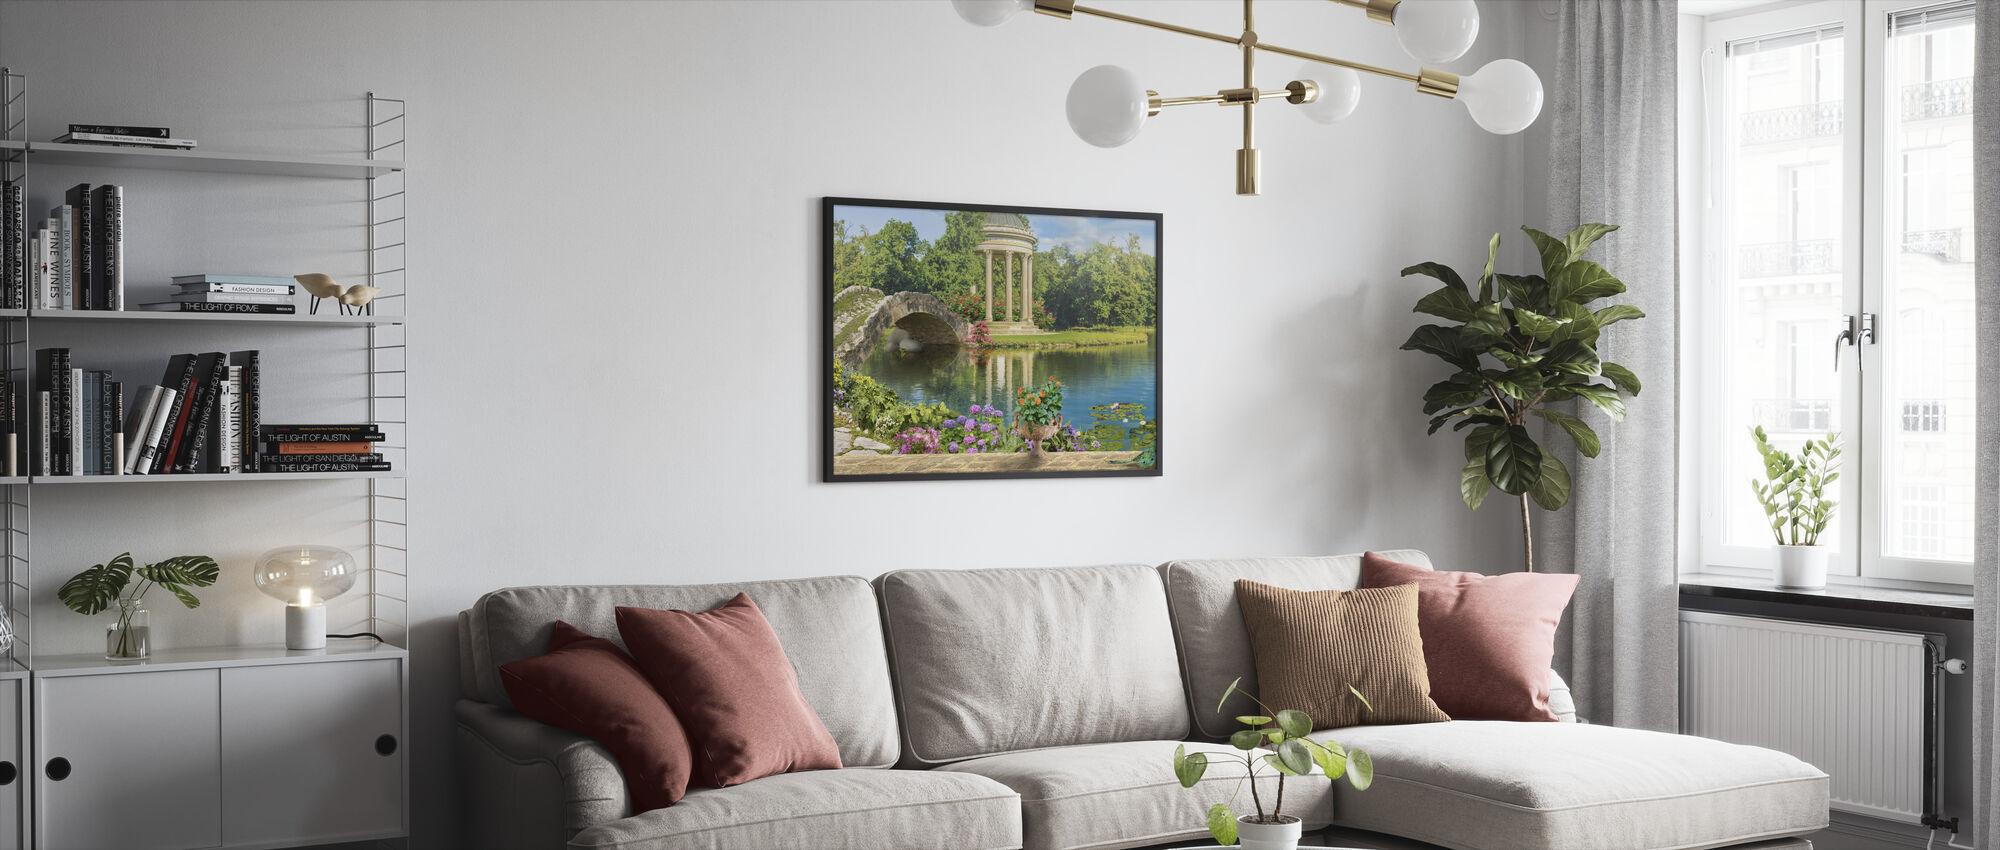 Swans in Pond - Framed print - Living Room